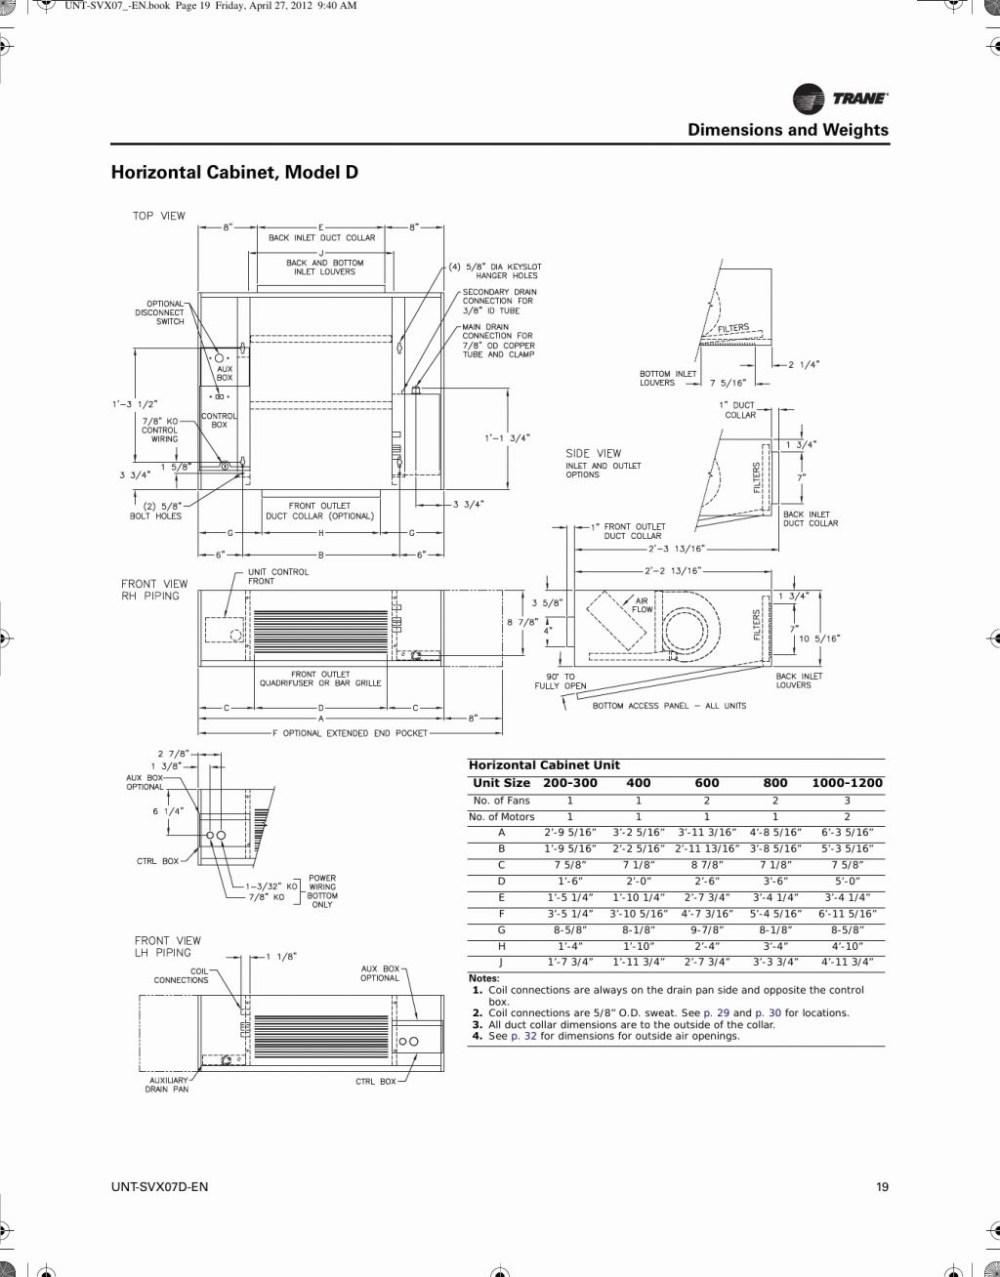 medium resolution of honda xl80 wiring diagram simple wiring schema 1994 honda accord wiring diagram 86 honda xr80 wiring diagram